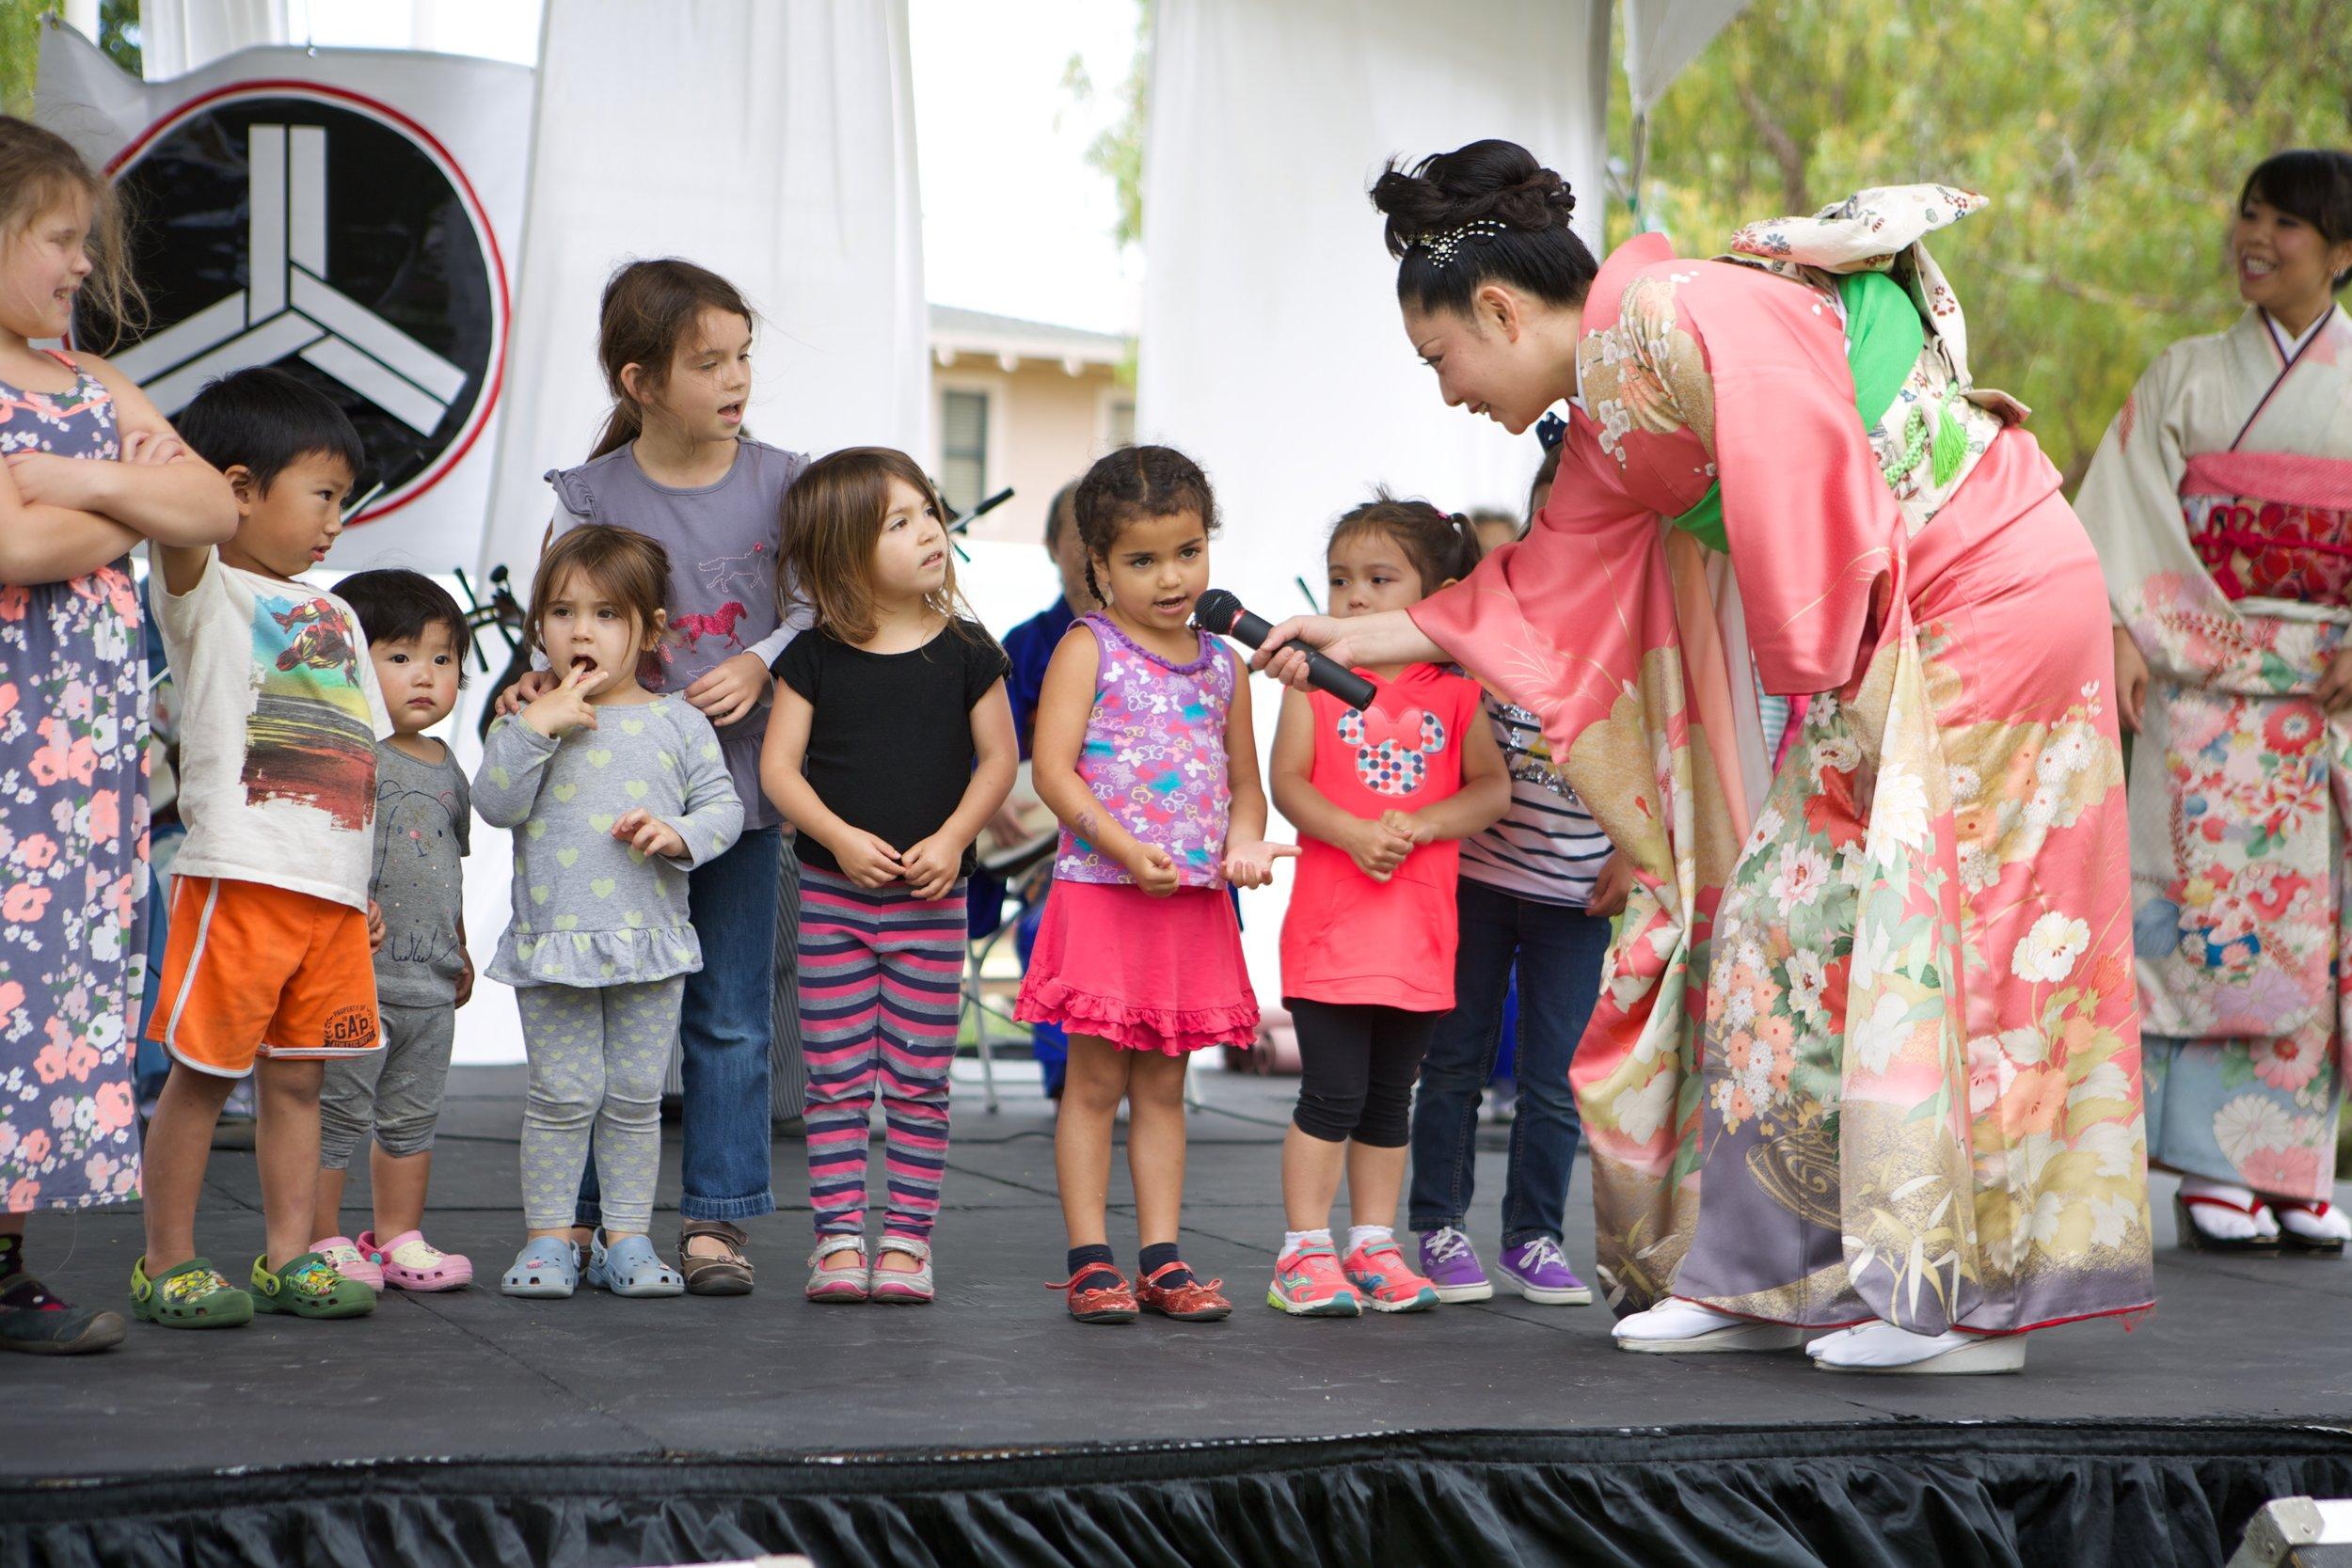 japanese-cultural-fair-of-santa-cruz-2015_19408700228_o.jpg